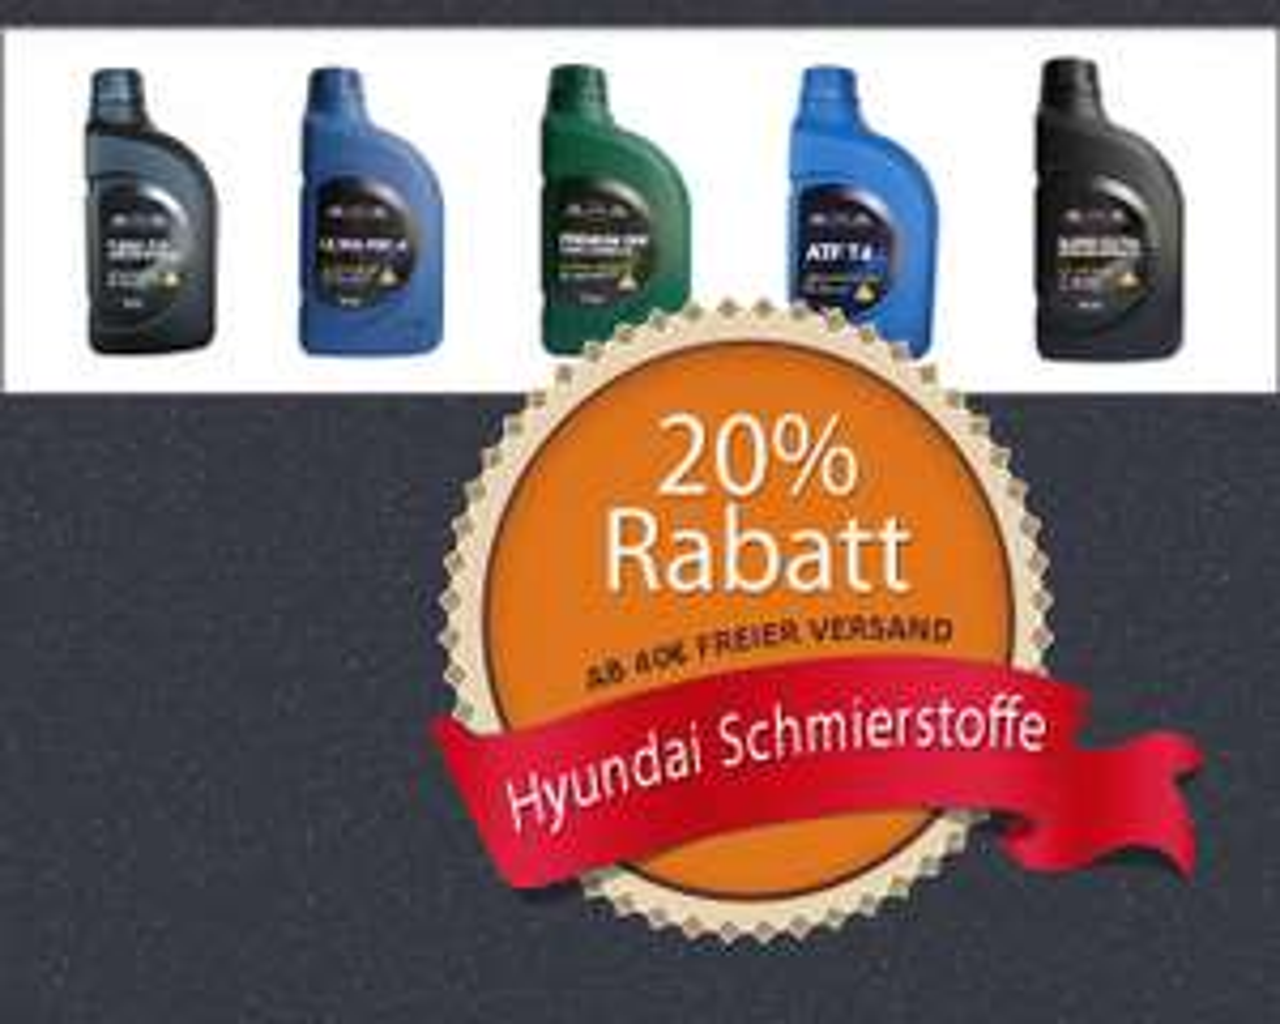 20% Rabatt auf Hyundai Öle